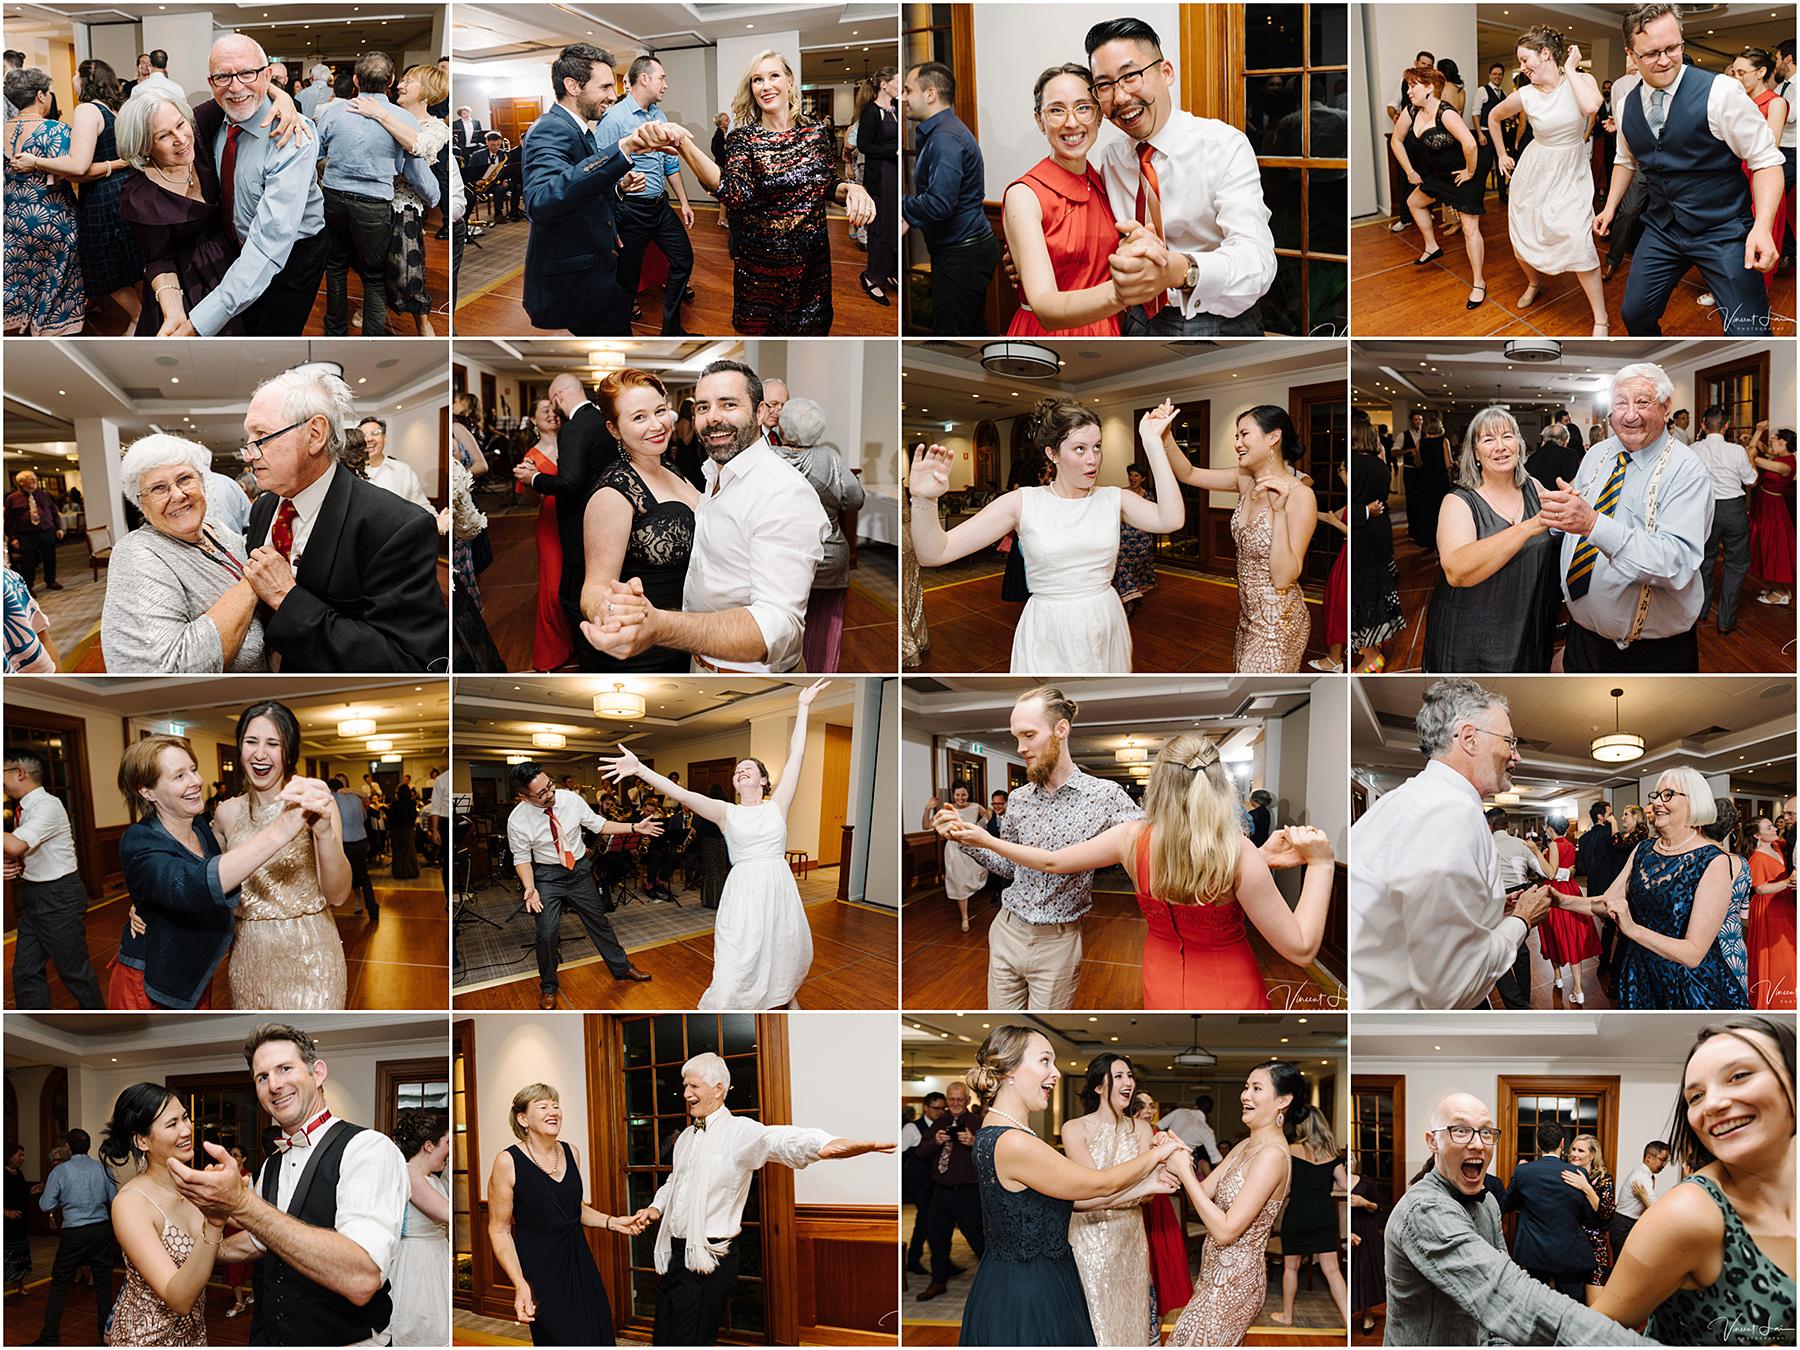 Wedding at Avondale Golf Club Pymble